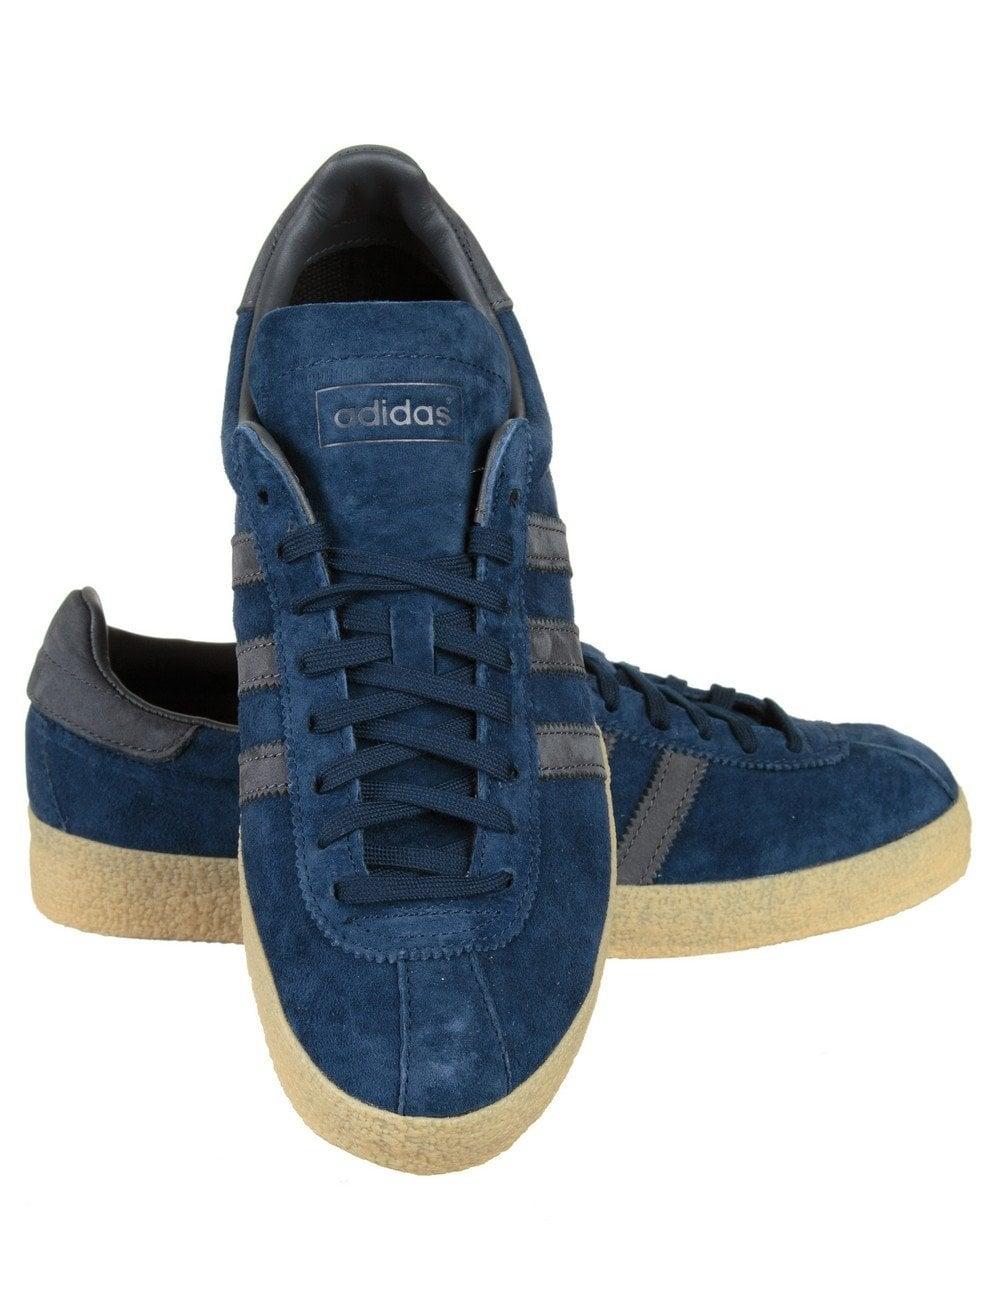 adidas Originals Topanga Suede Sneakers